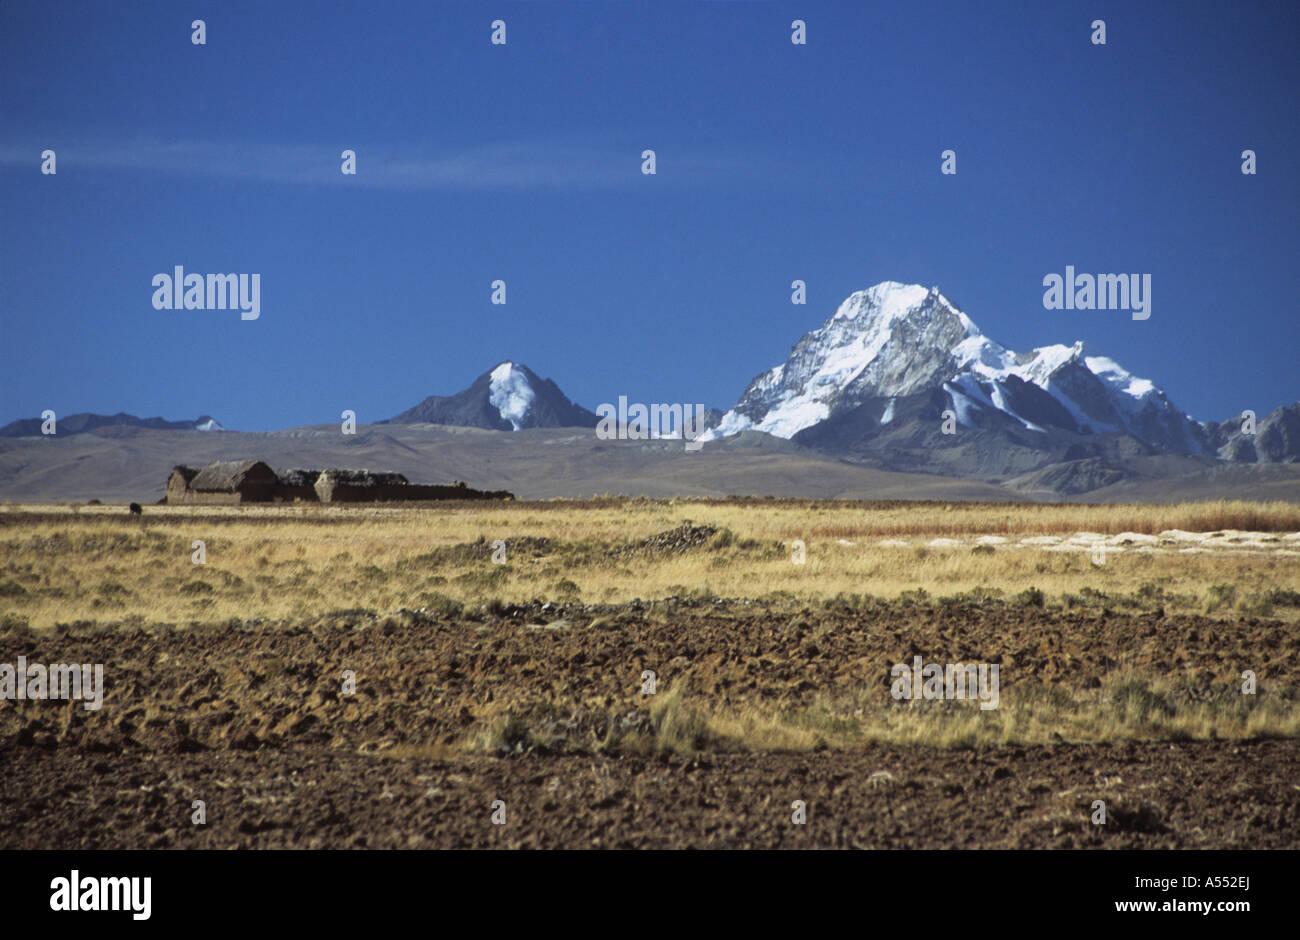 Mt Huayna Potosi and farm on altiplano near Laja, Cordillera Real, Bolivia - Stock Image